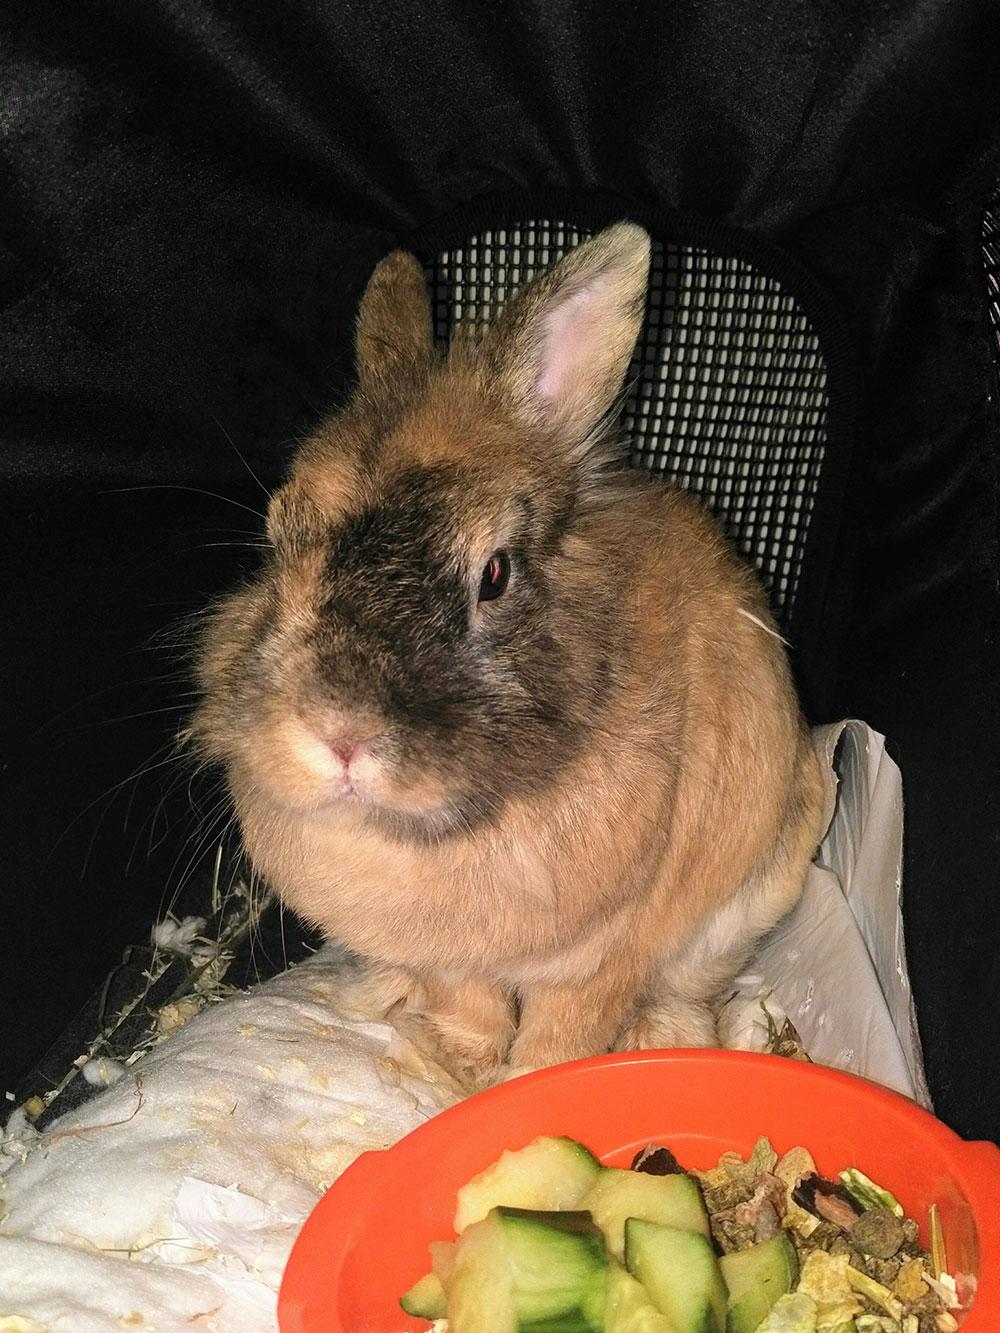 Rabbit Samson, who belongs to Anna, seems to be enjoying the cruise.